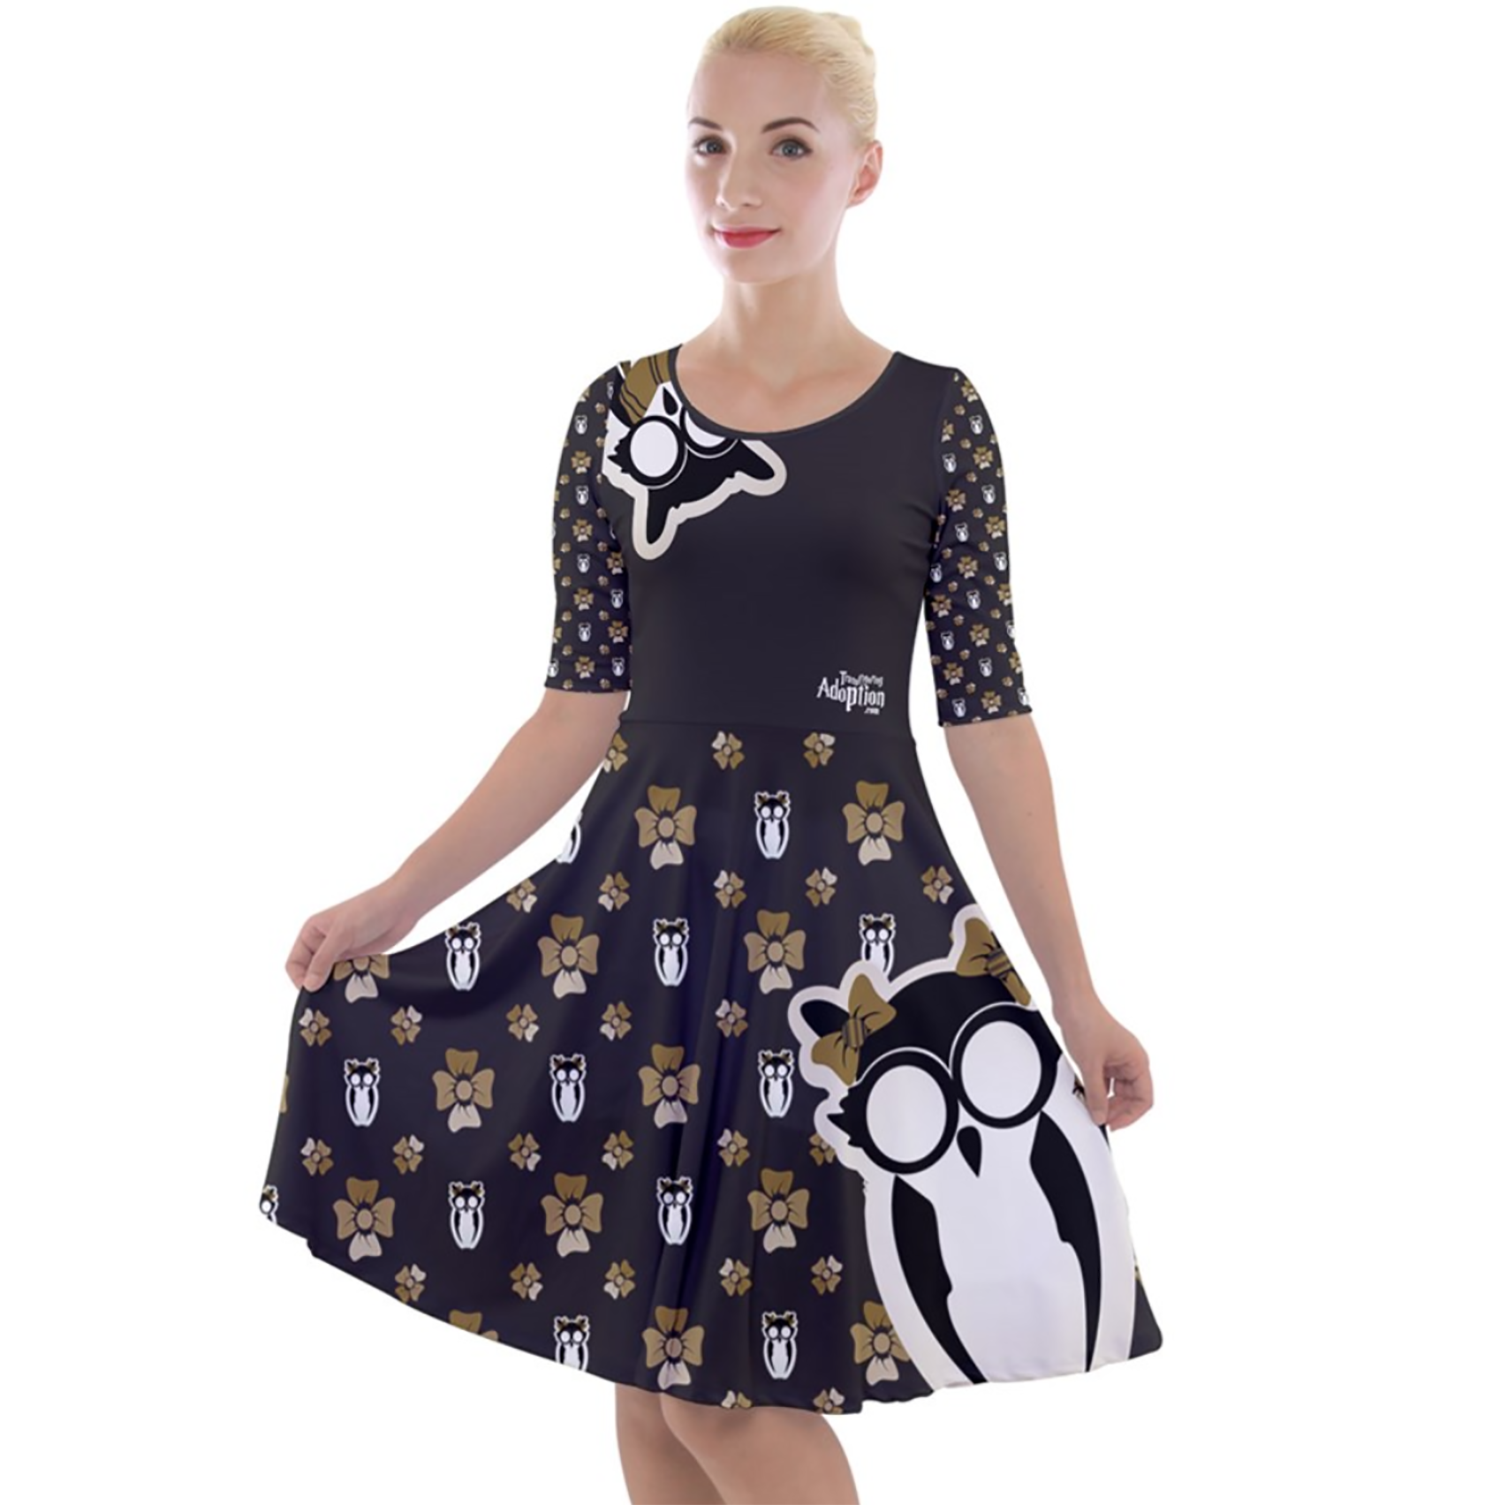 Owl (Yellow) Pattern Dress - Quarter Sleeve A-Line Dress - Inspired by Hufflepuff